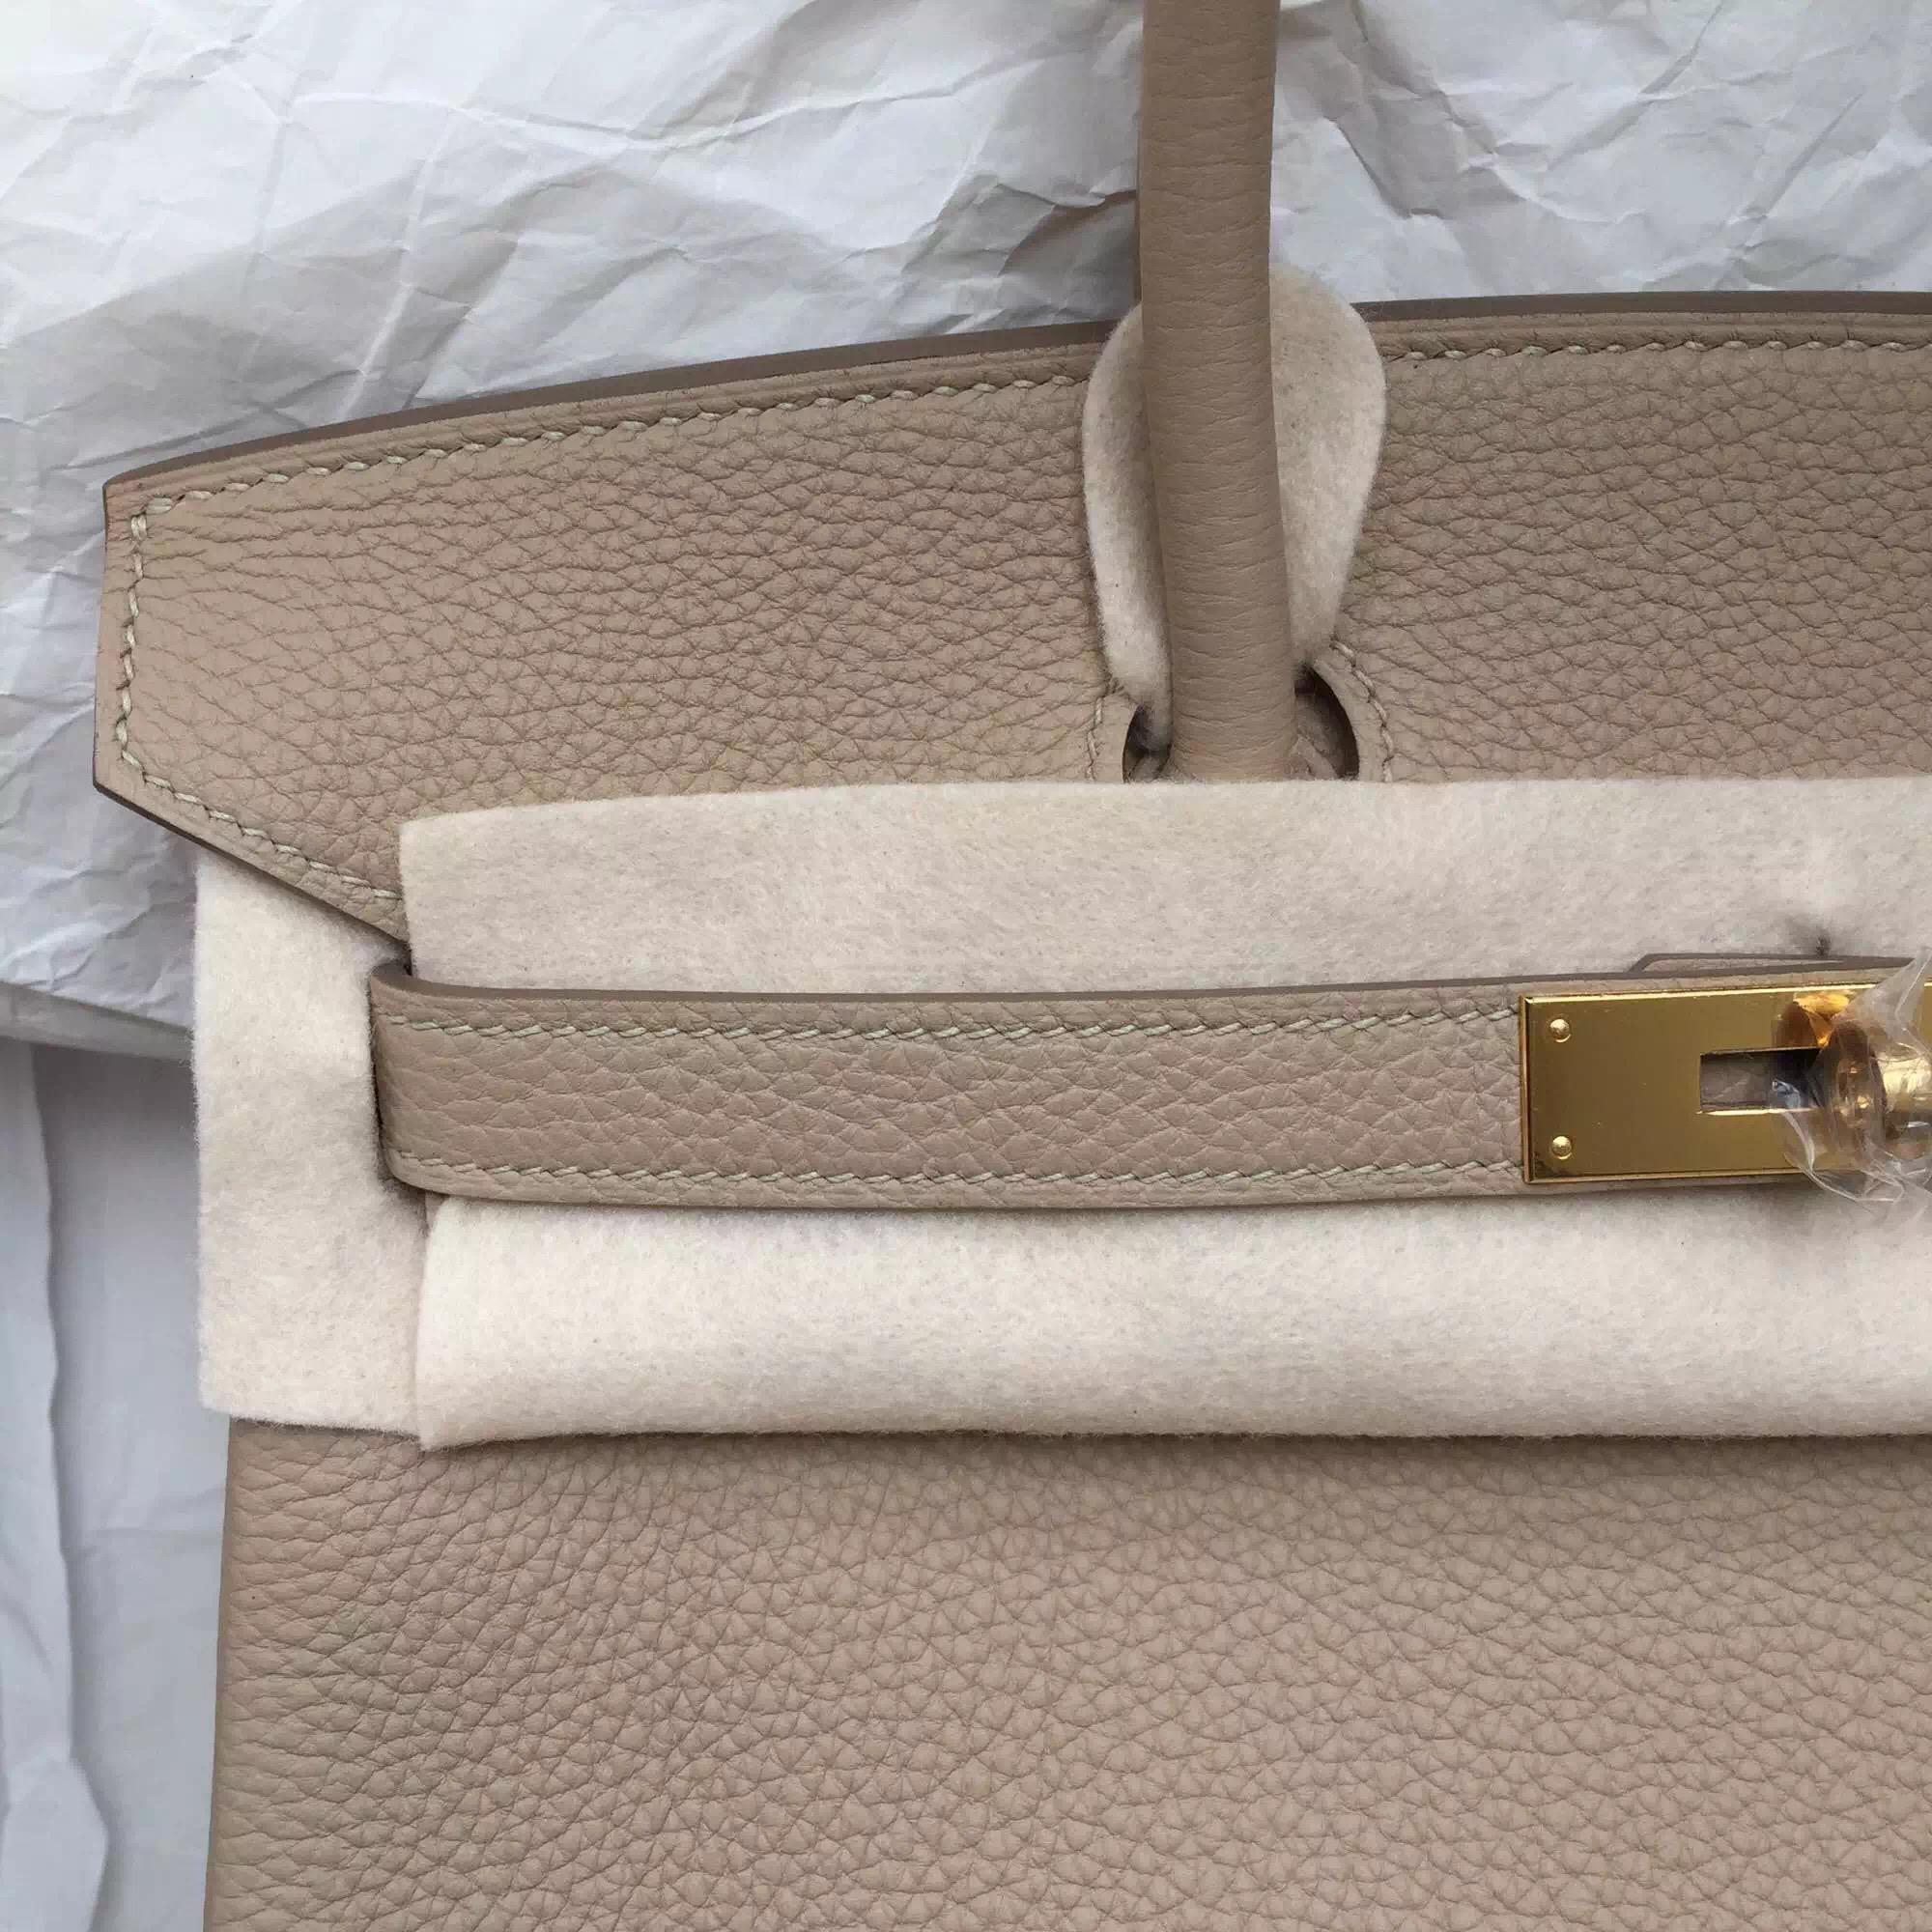 Discount Hermes Birkin 30 Diamond Grey Togo Leather Gold Hardware